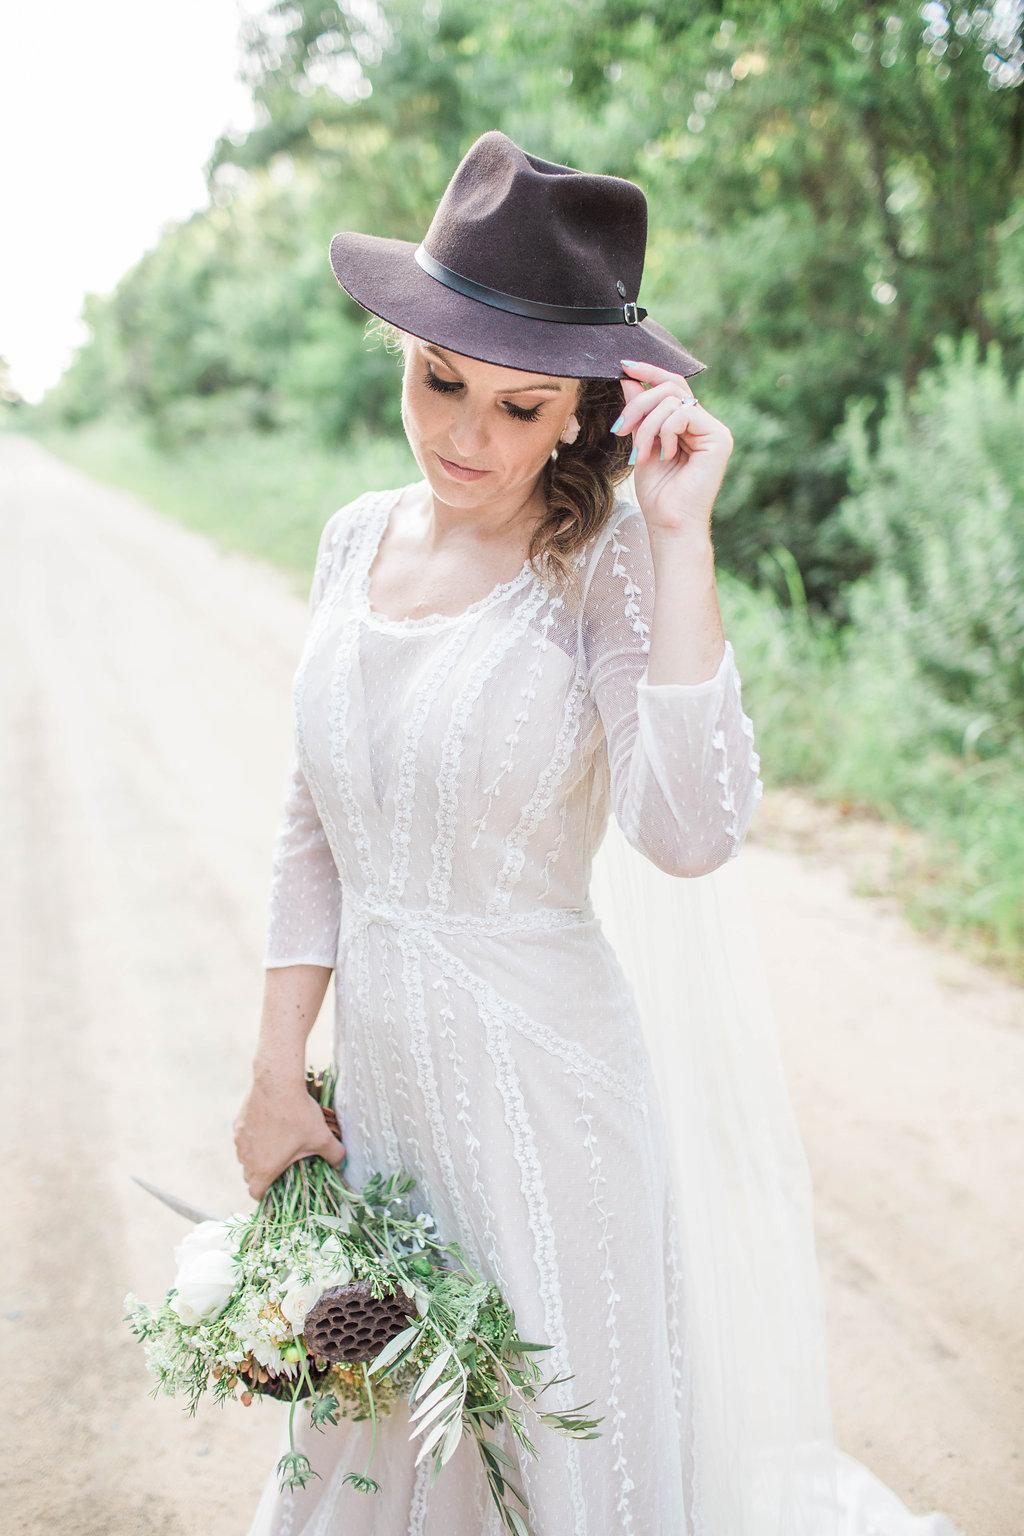 apt-b-photography-ivory-and-beau-bridal-boutique-anna-campbell-isobelle-australian-wedding-the-collins-quarter-savannah-wedding-savannah-weddings-savannah-florist-savannah-bridal-savannah-event-designer-savannah-wedding-dresses-outback-wedding-26.jpg